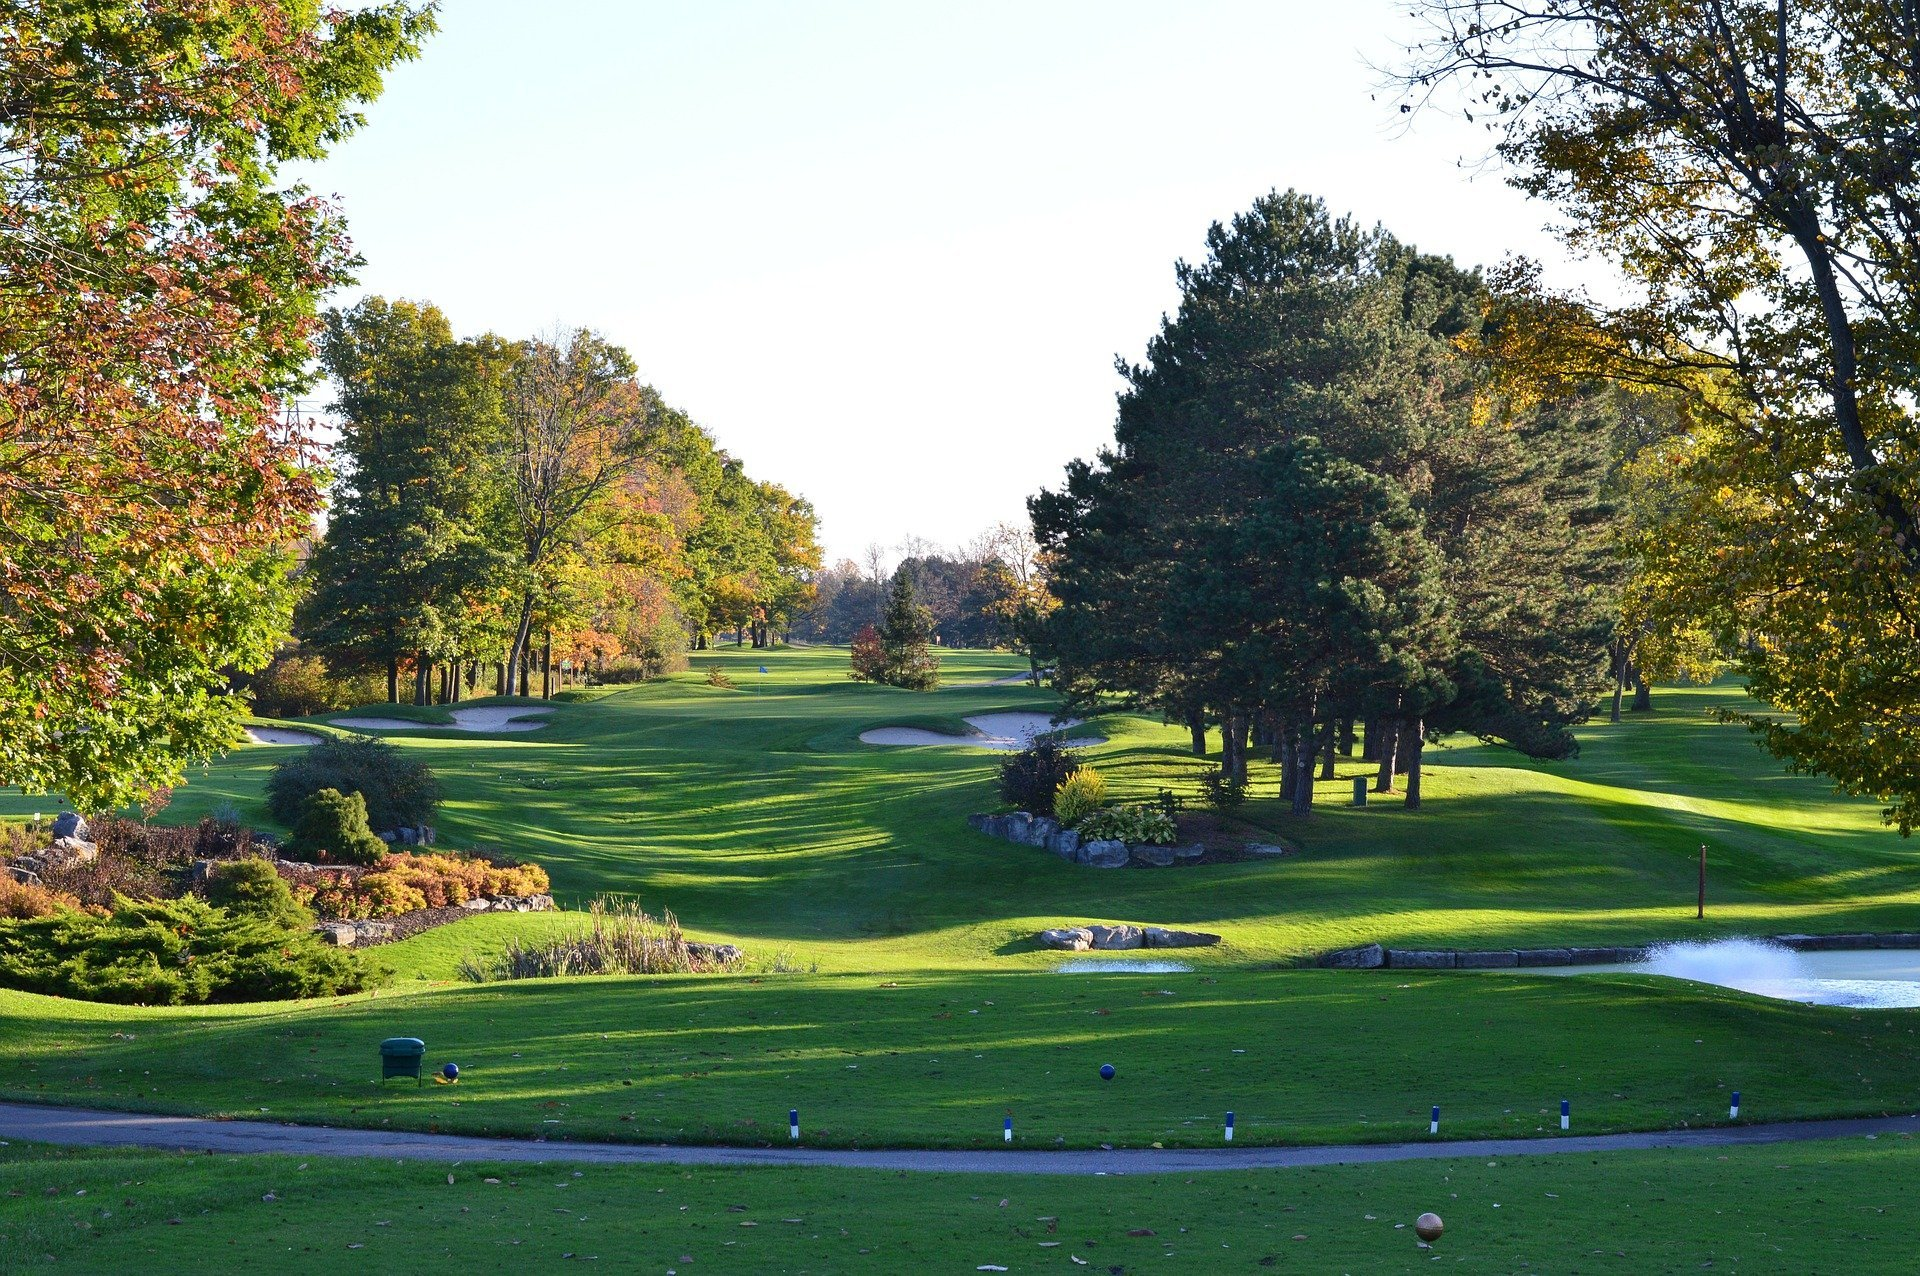 Golfing green. | Source: Pixabay